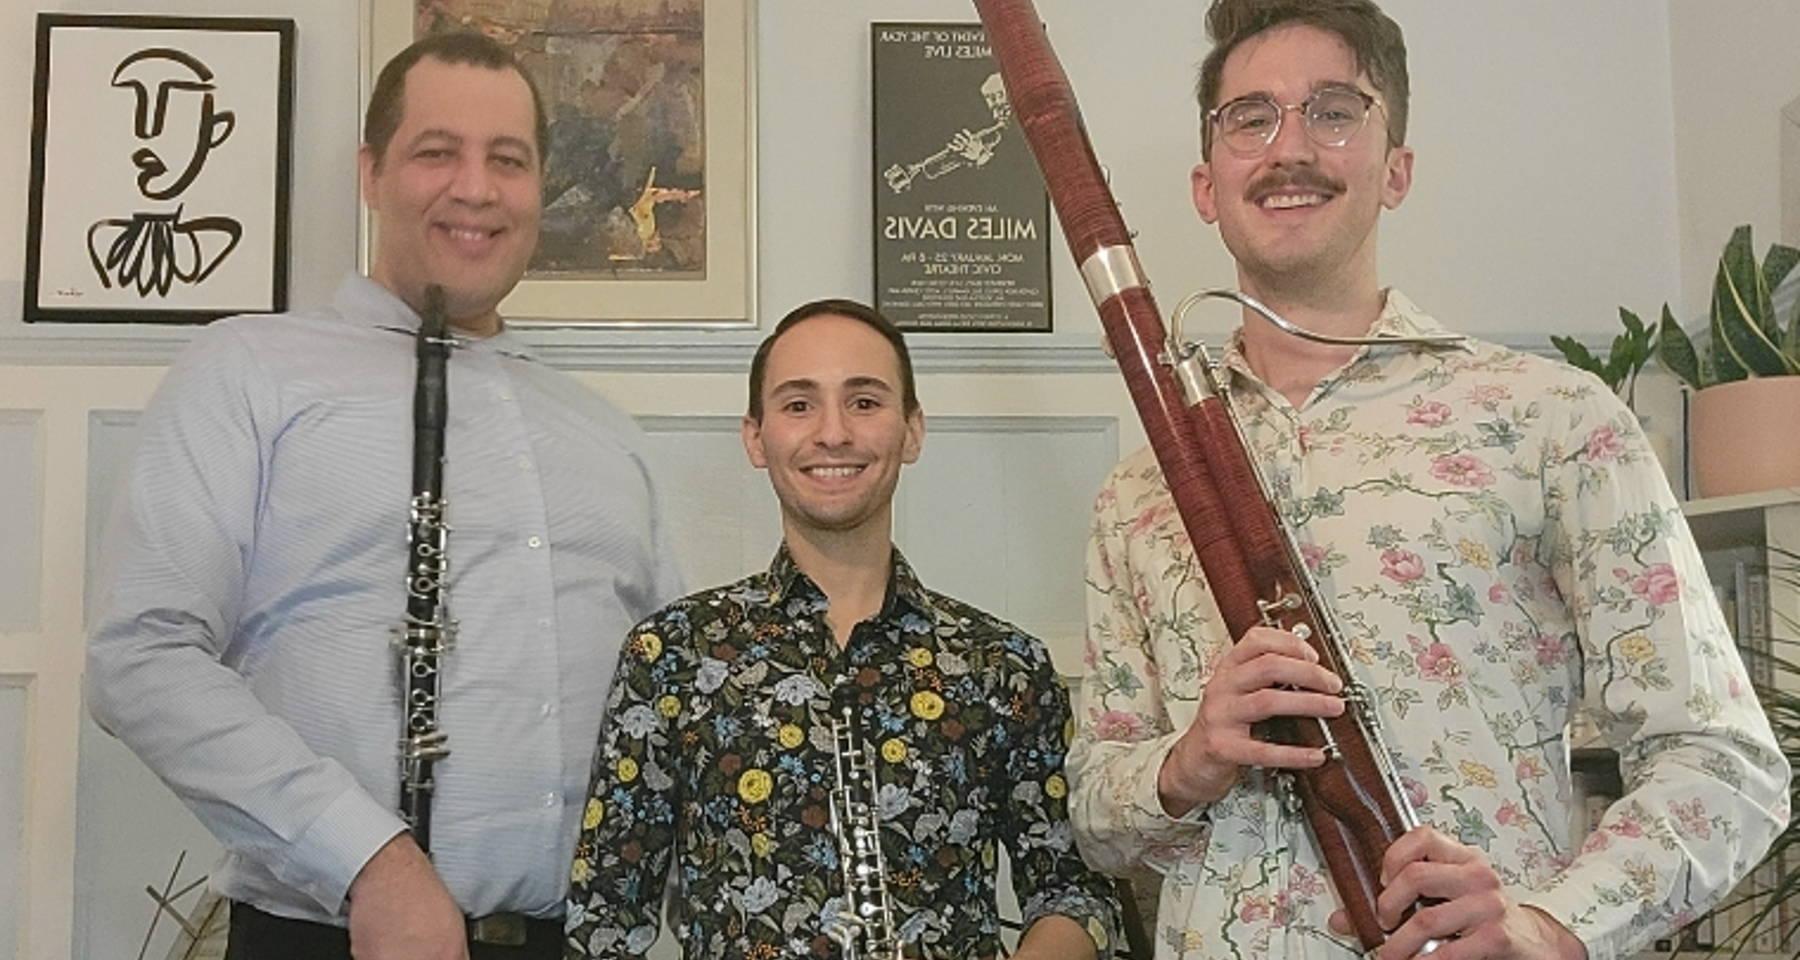 Trio212 presents Mozart opera arias